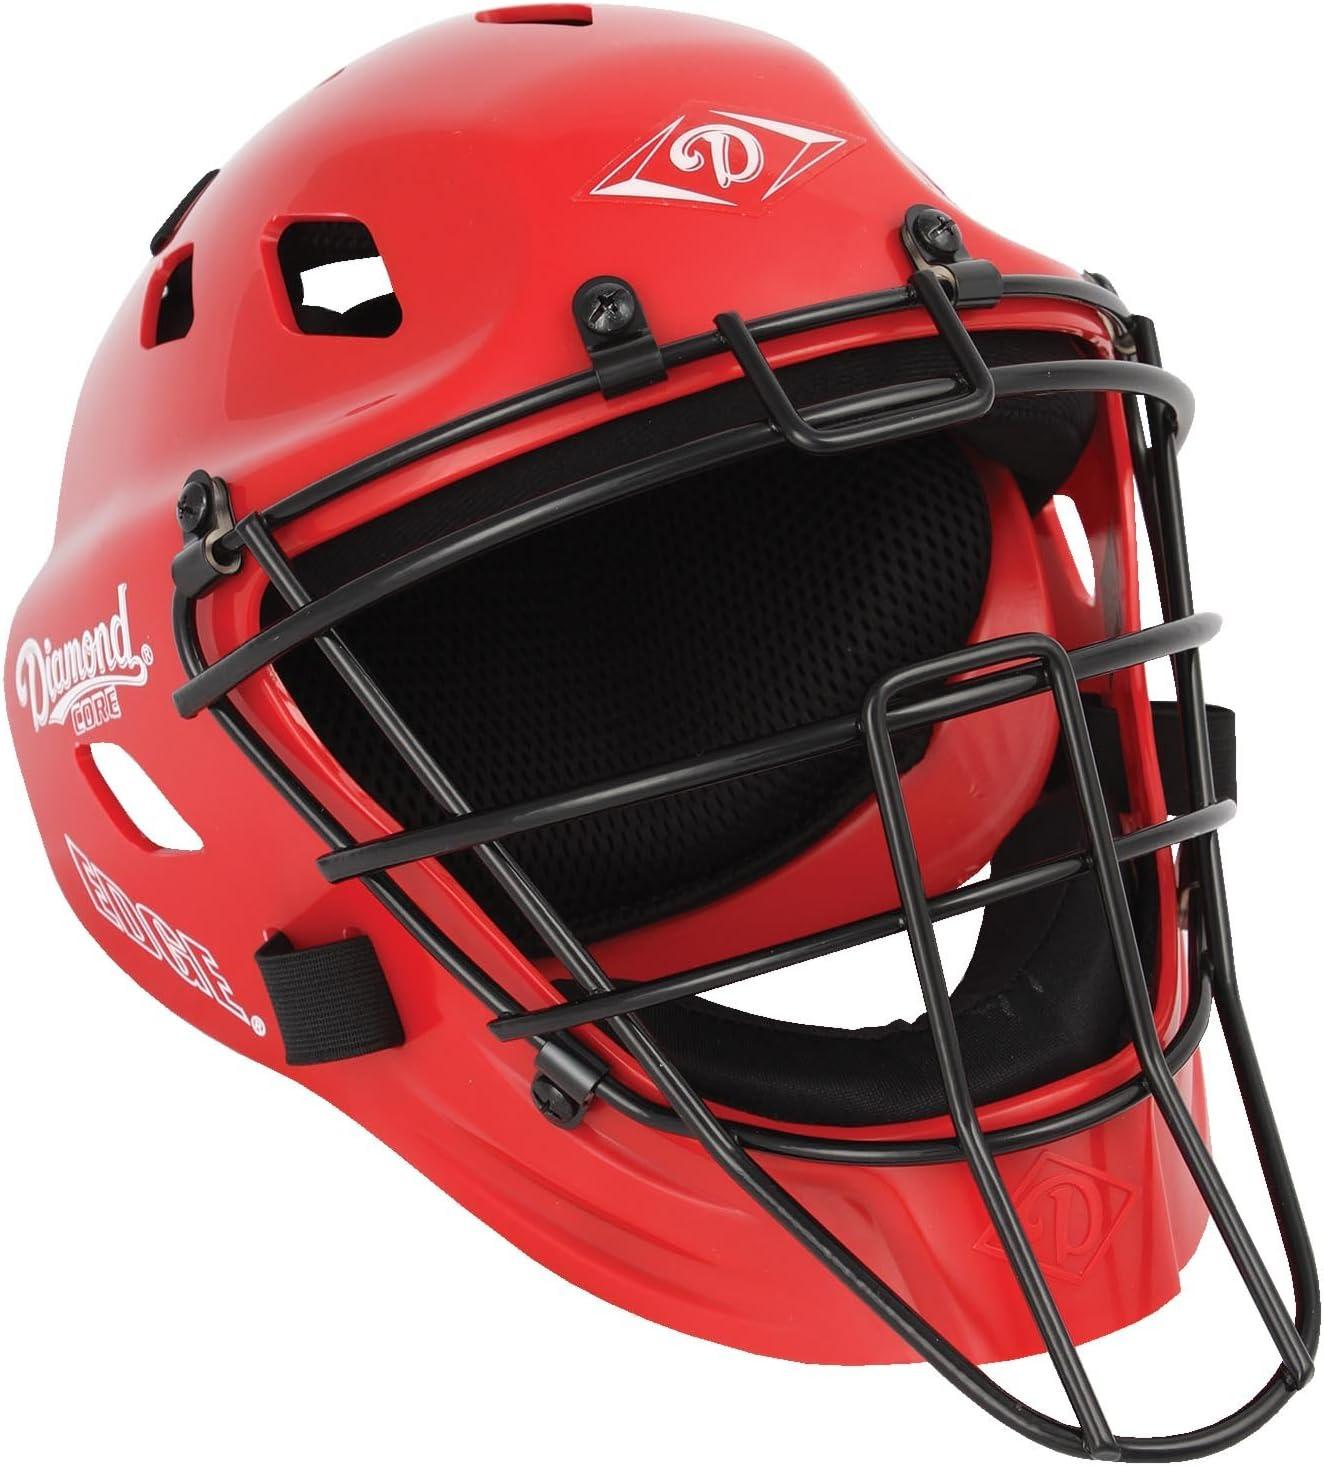 Diamond DCH-EDGE Ranking TOP8 CX Max 90% OFF SM Edge Hockey Helmet Cather's Style S Small